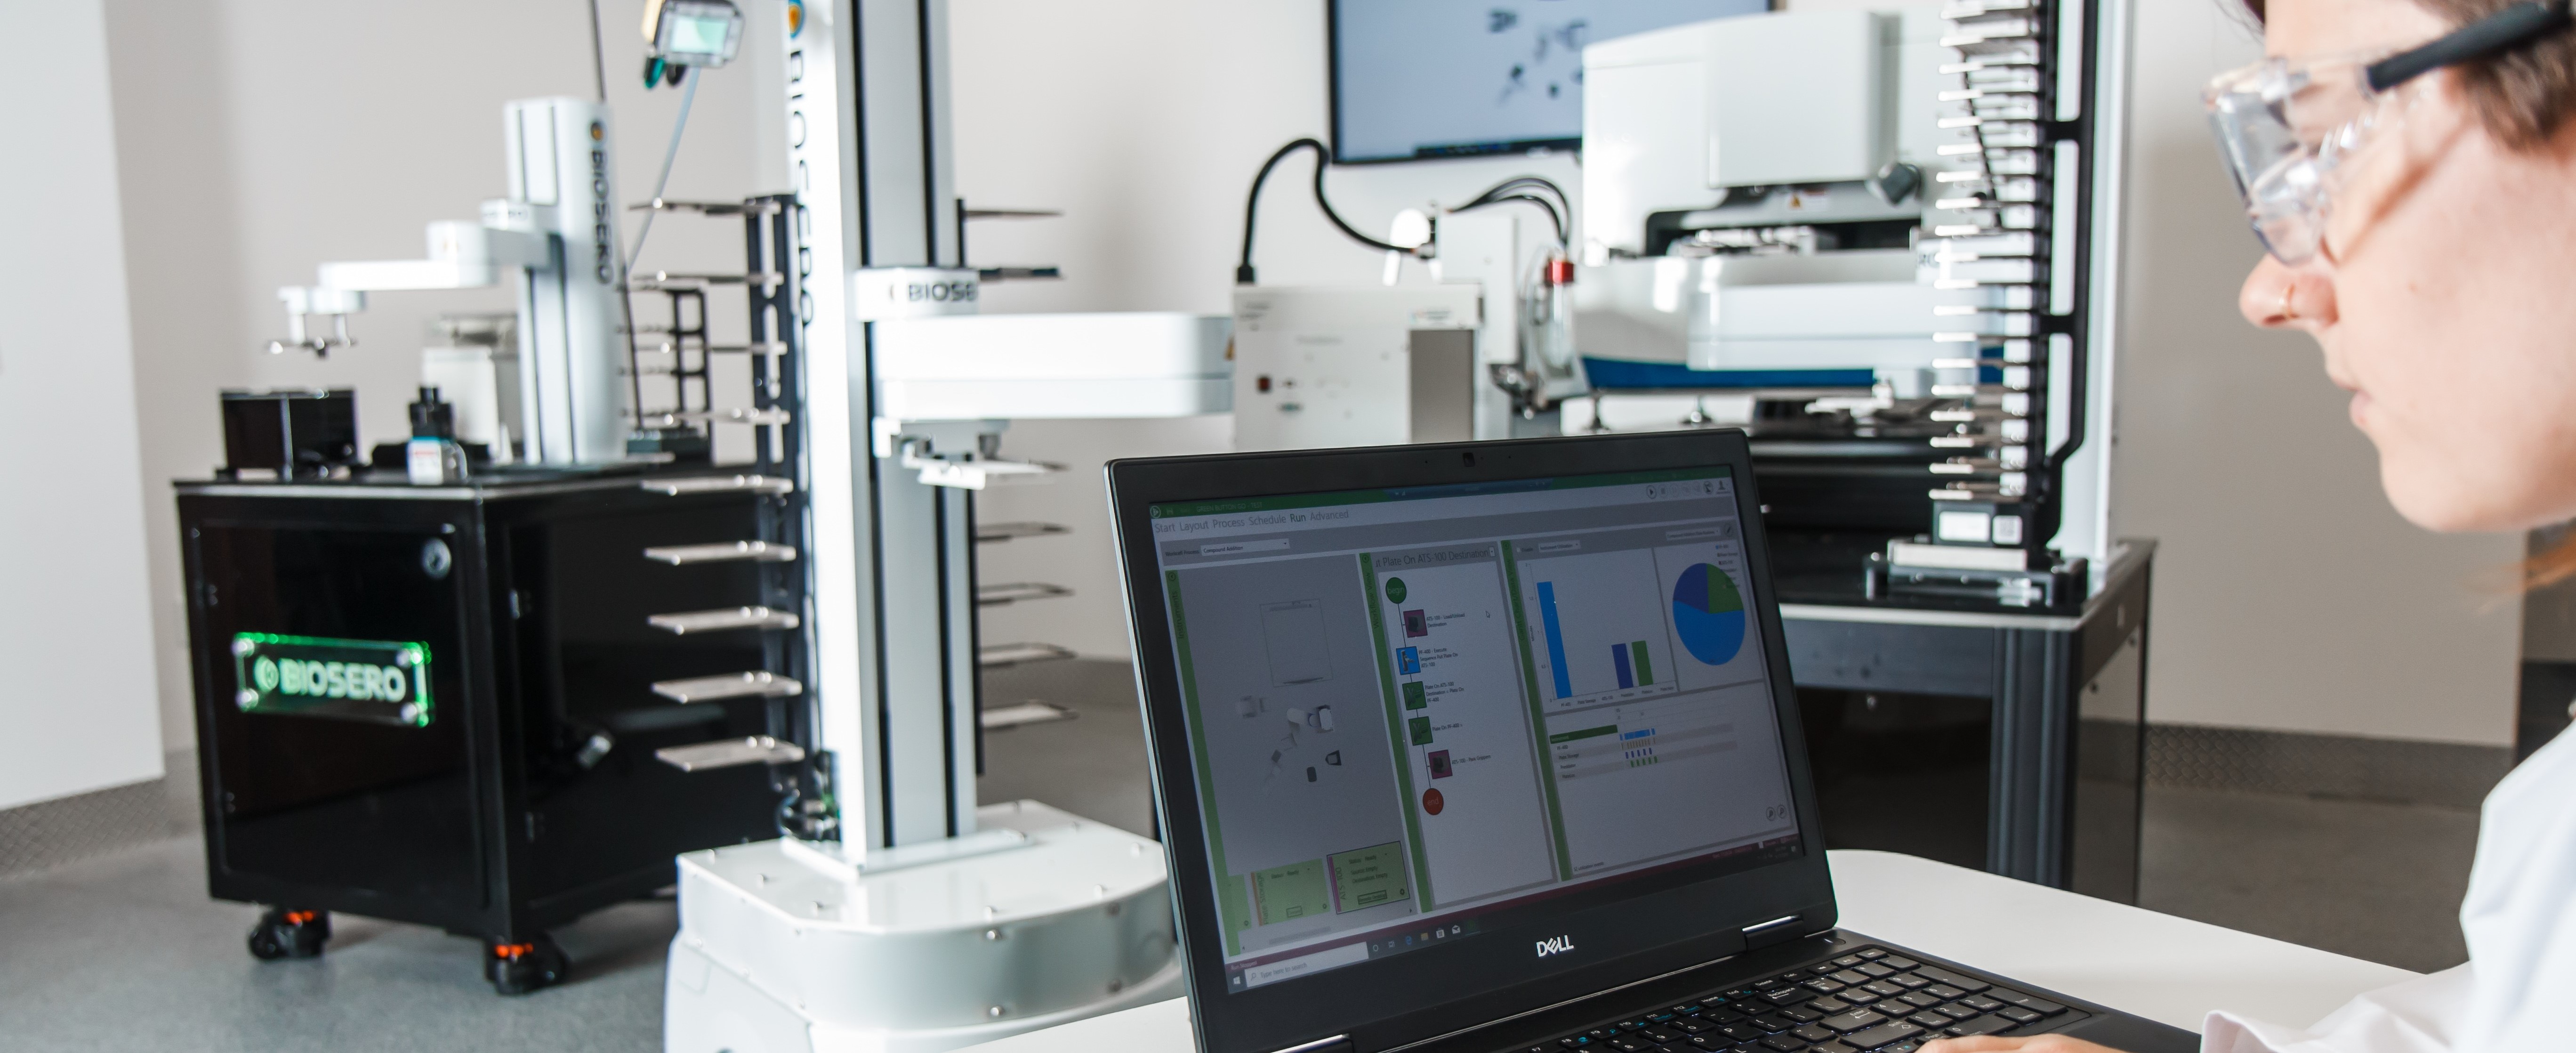 Option 3: Experience the Biosero Acceleration Lab